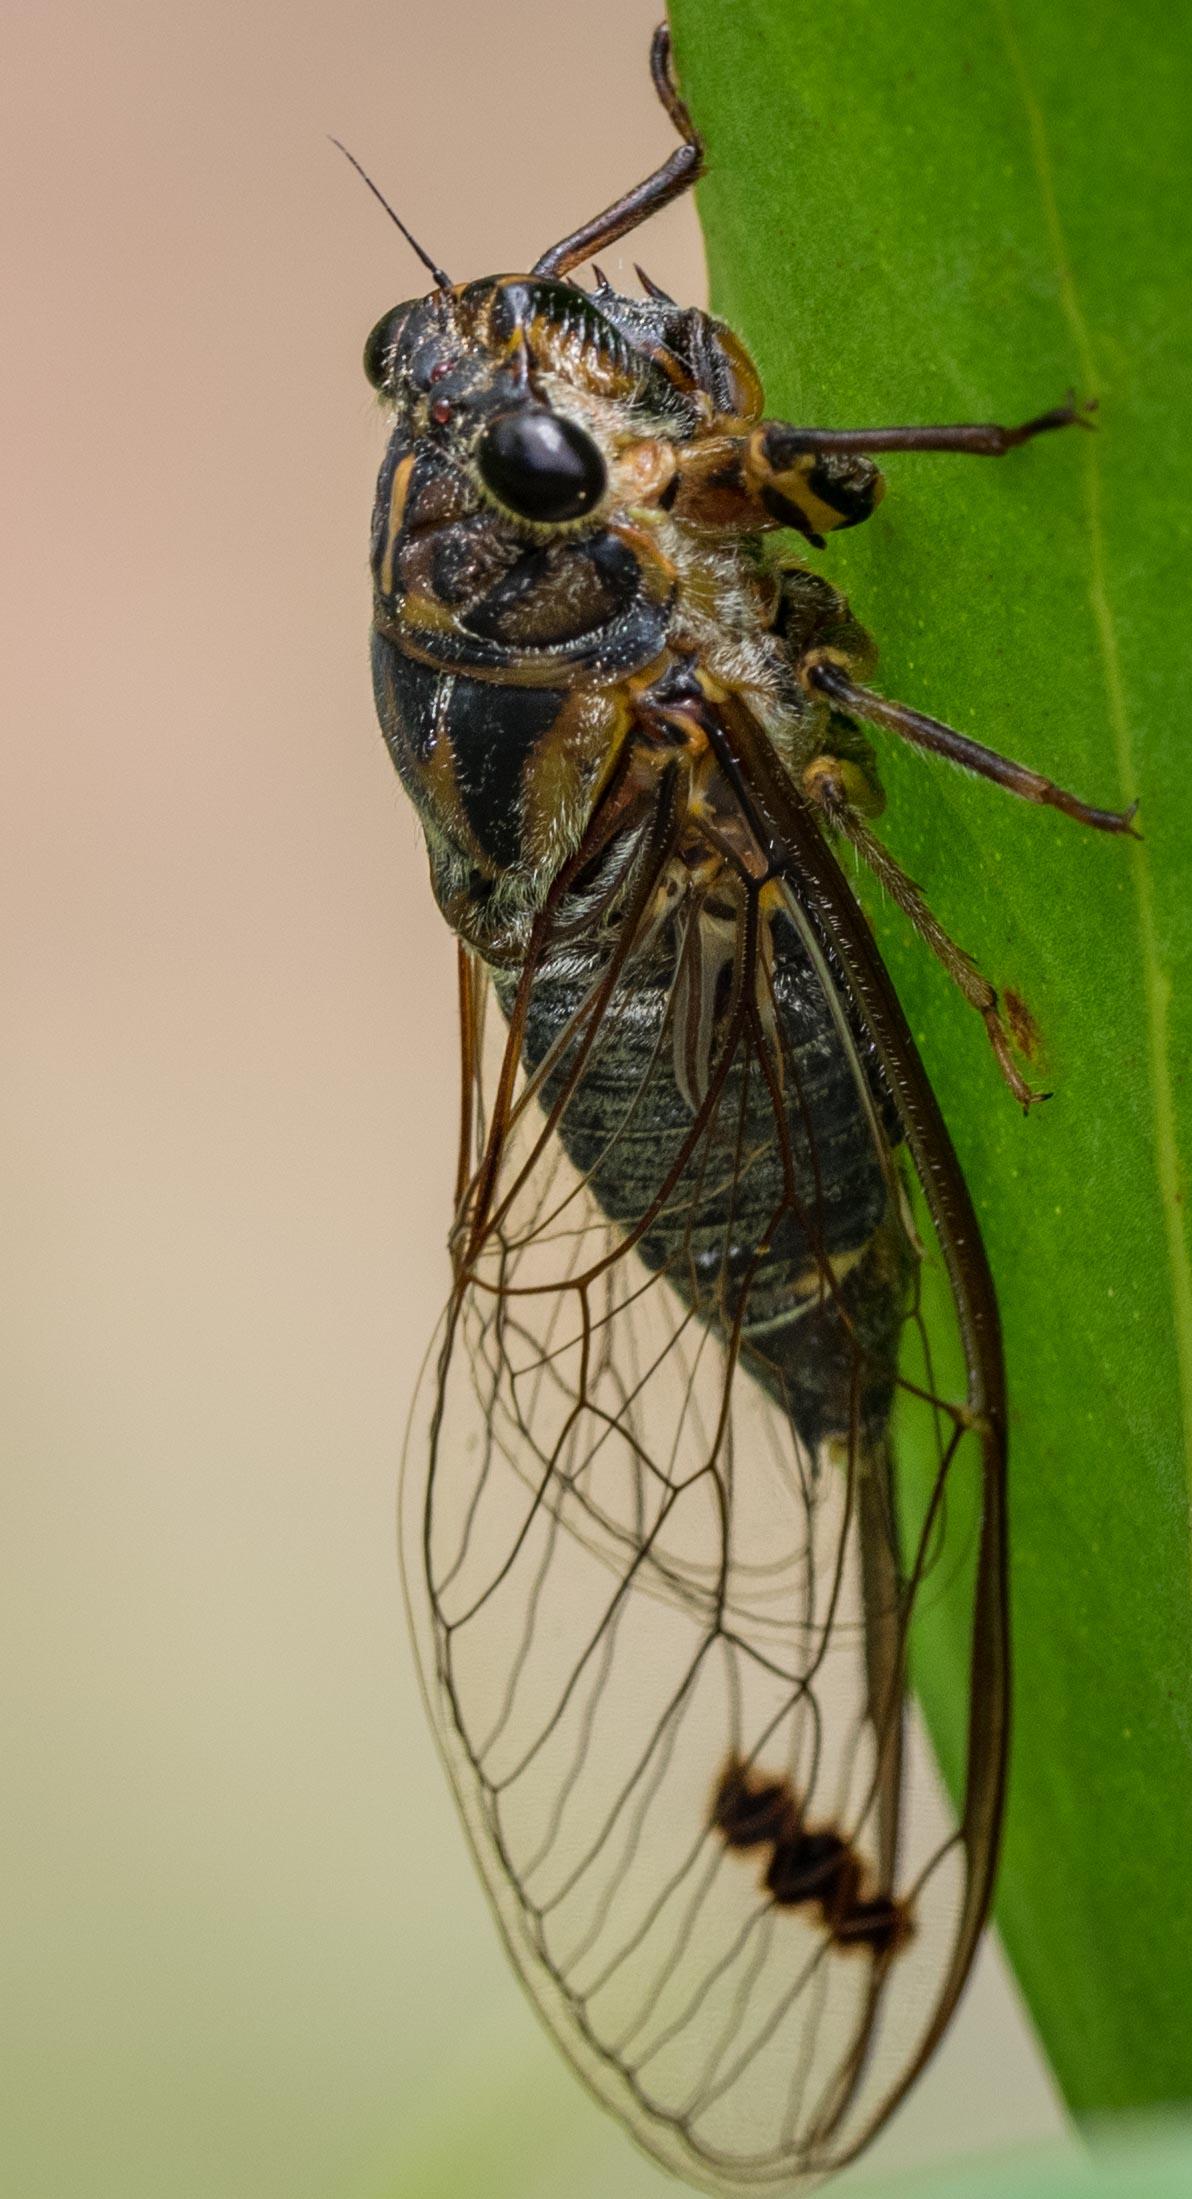 Double-spotted Cicada,  Galanga labeculata   Order: Hemiptera; Family: Cicadidae